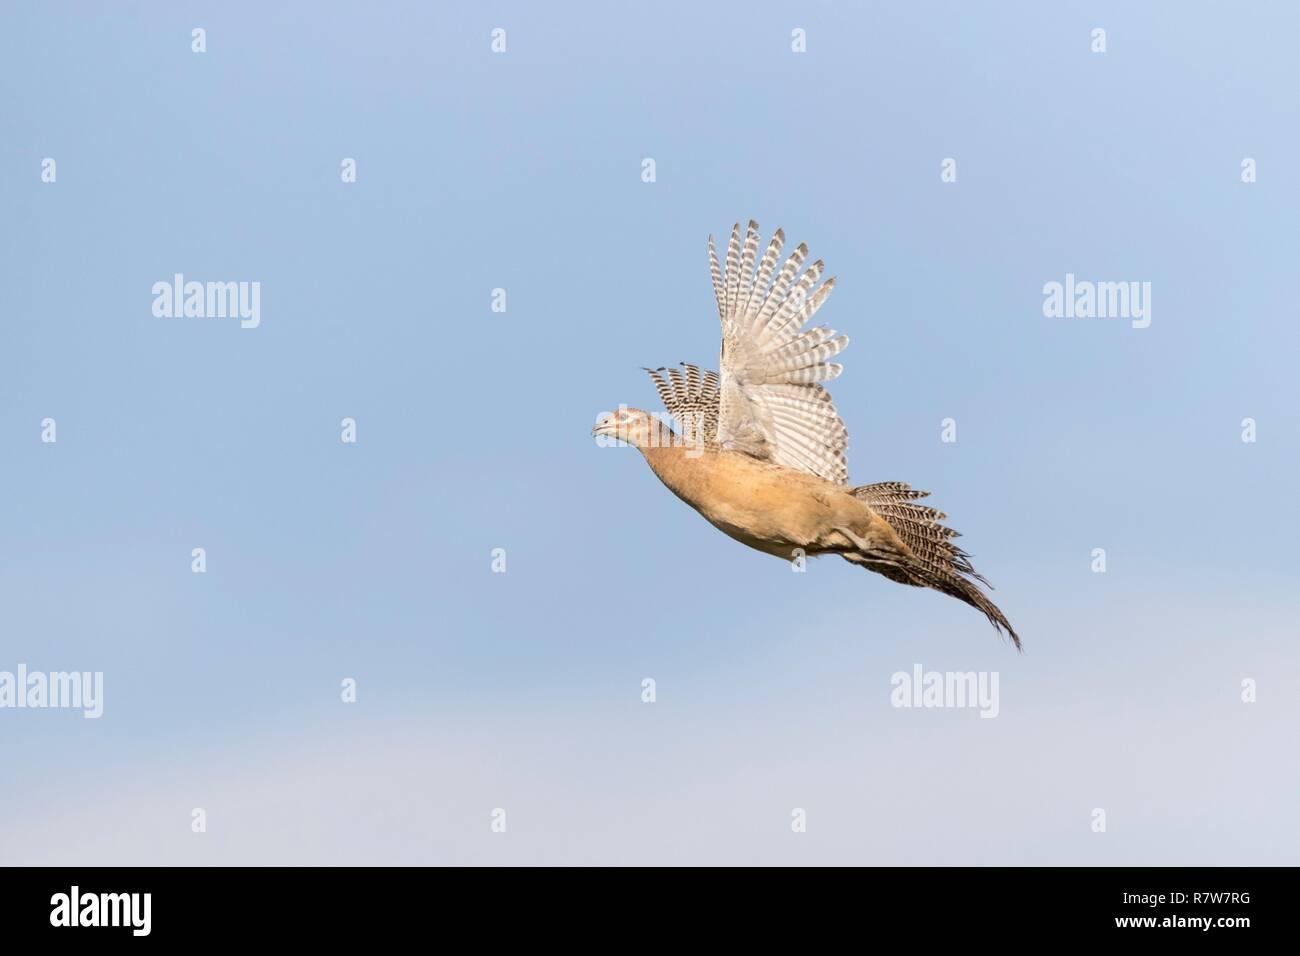 France, Bas Rhin, Common Pheasant (Phasianus colchicus), female - Stock Image